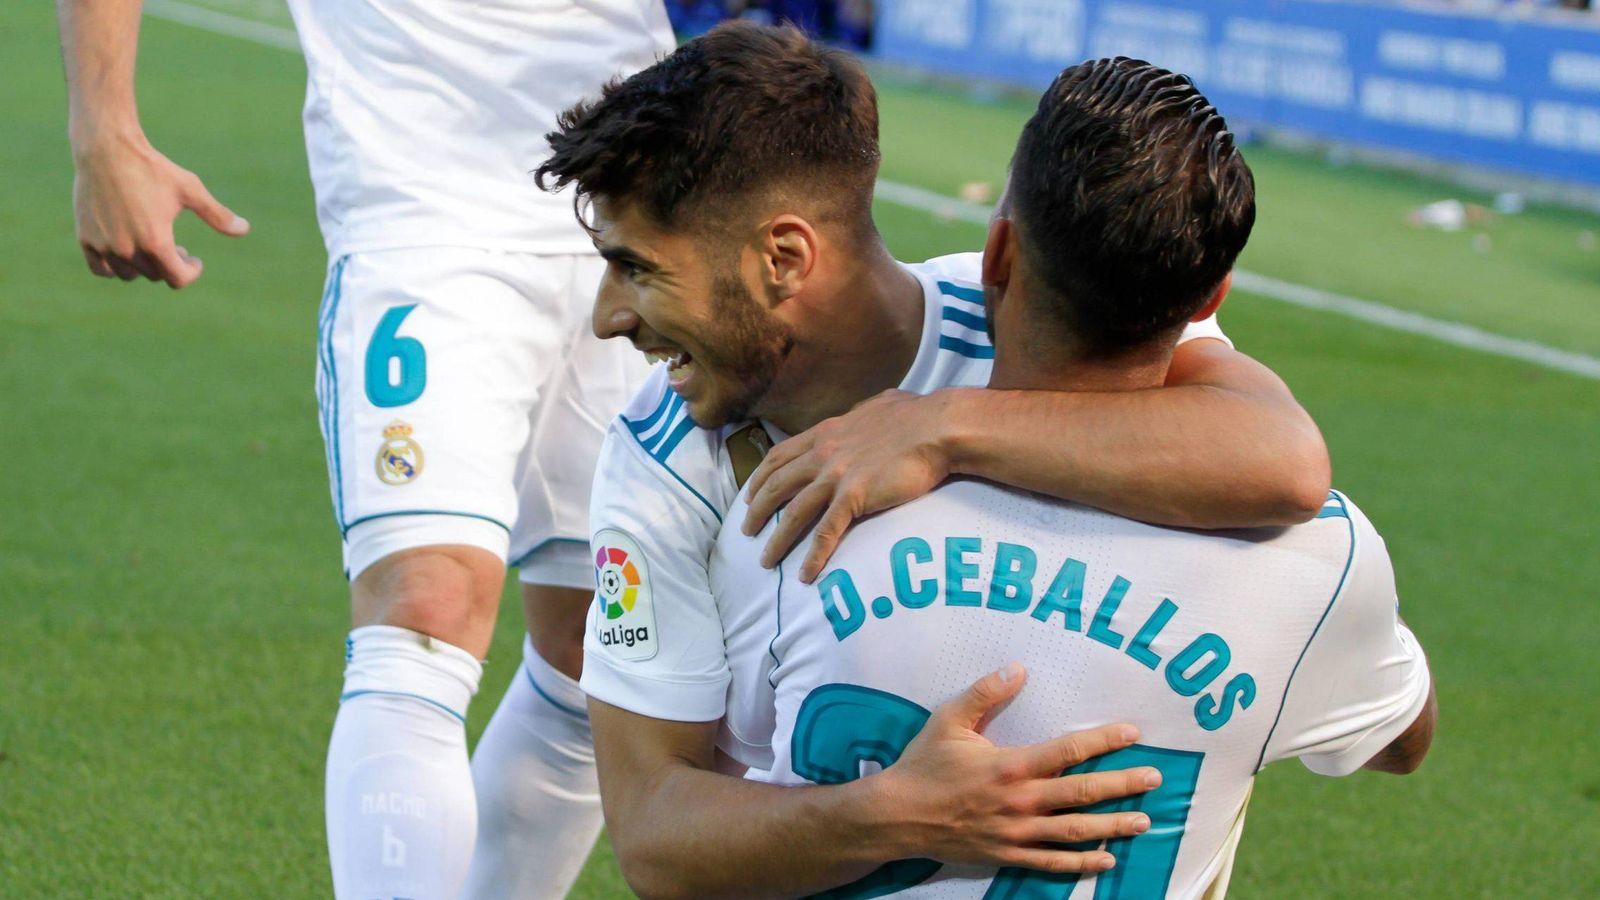 Foto: Asensio celebra un gol de Ceballos en Vitoria. (Cordon Press)